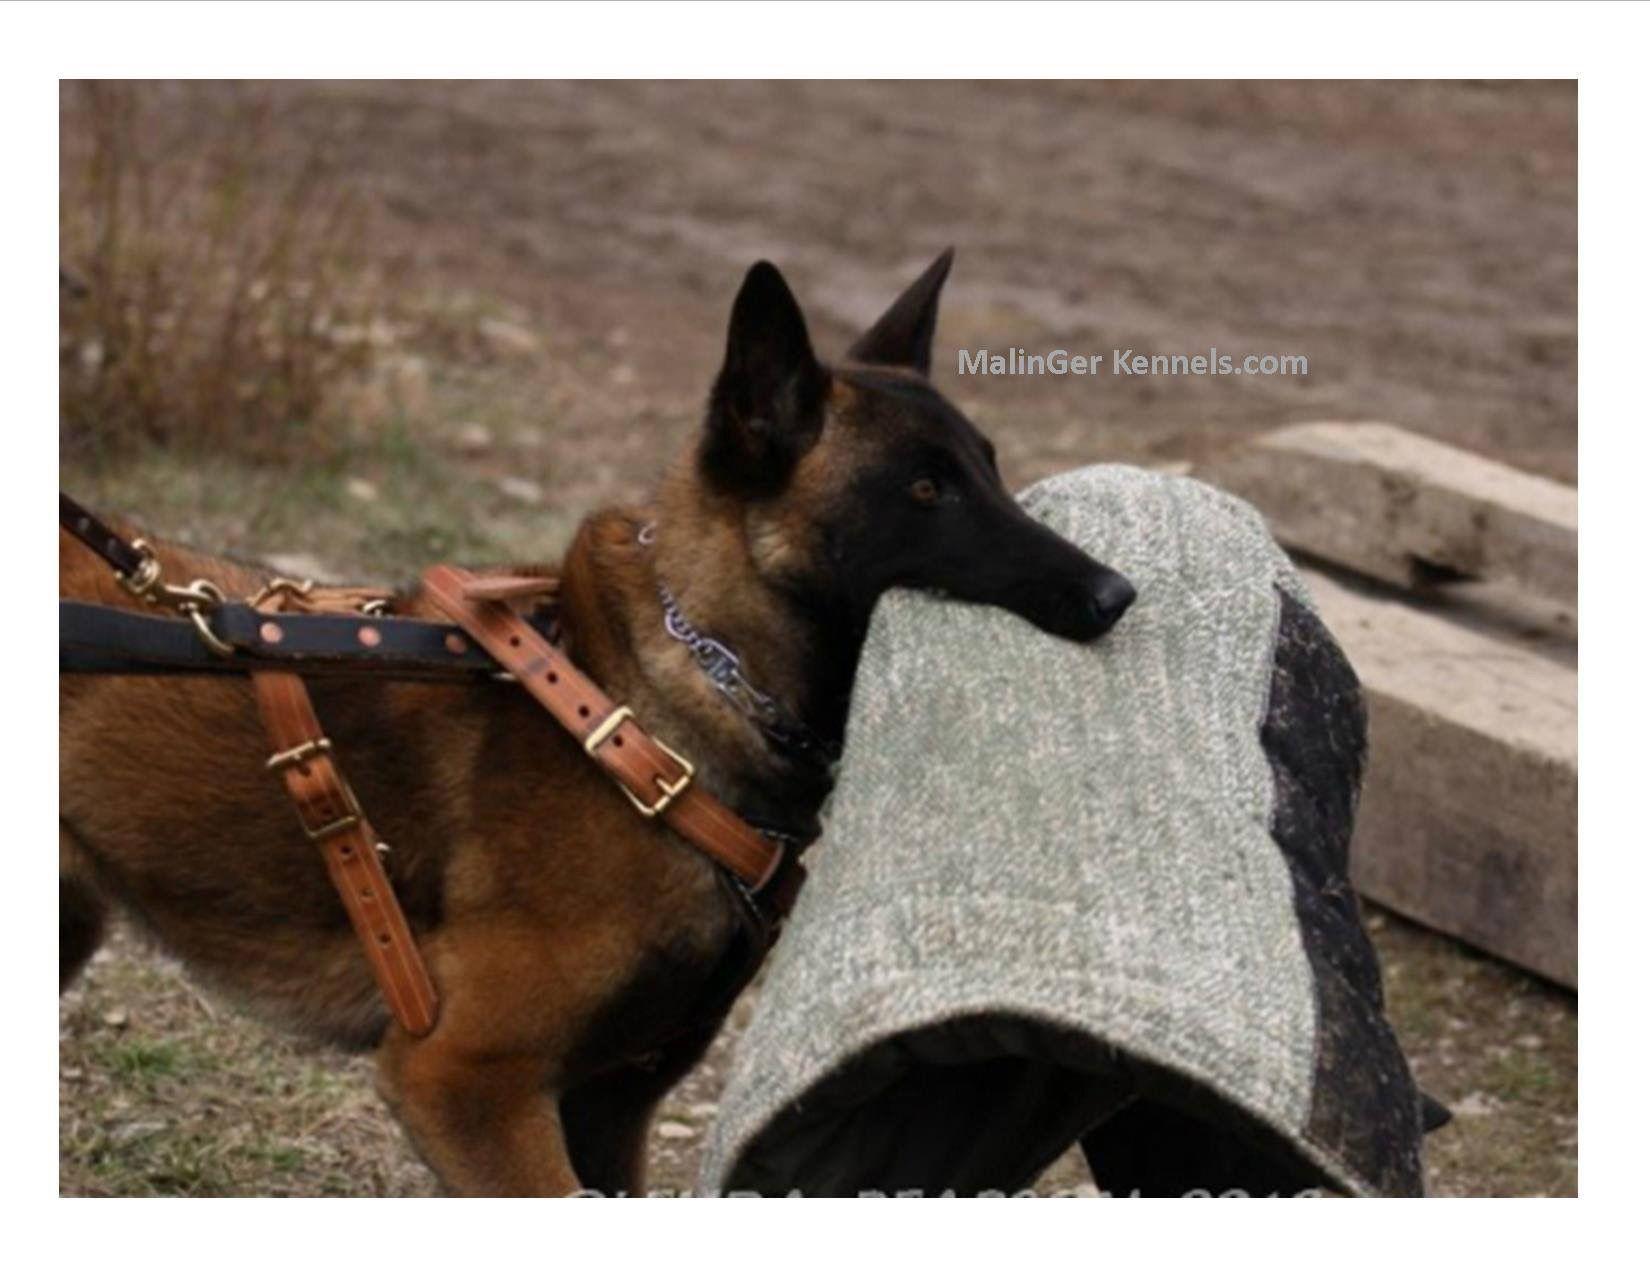 Belgian Malinois With Images Belgian Malinois Dog Belgian